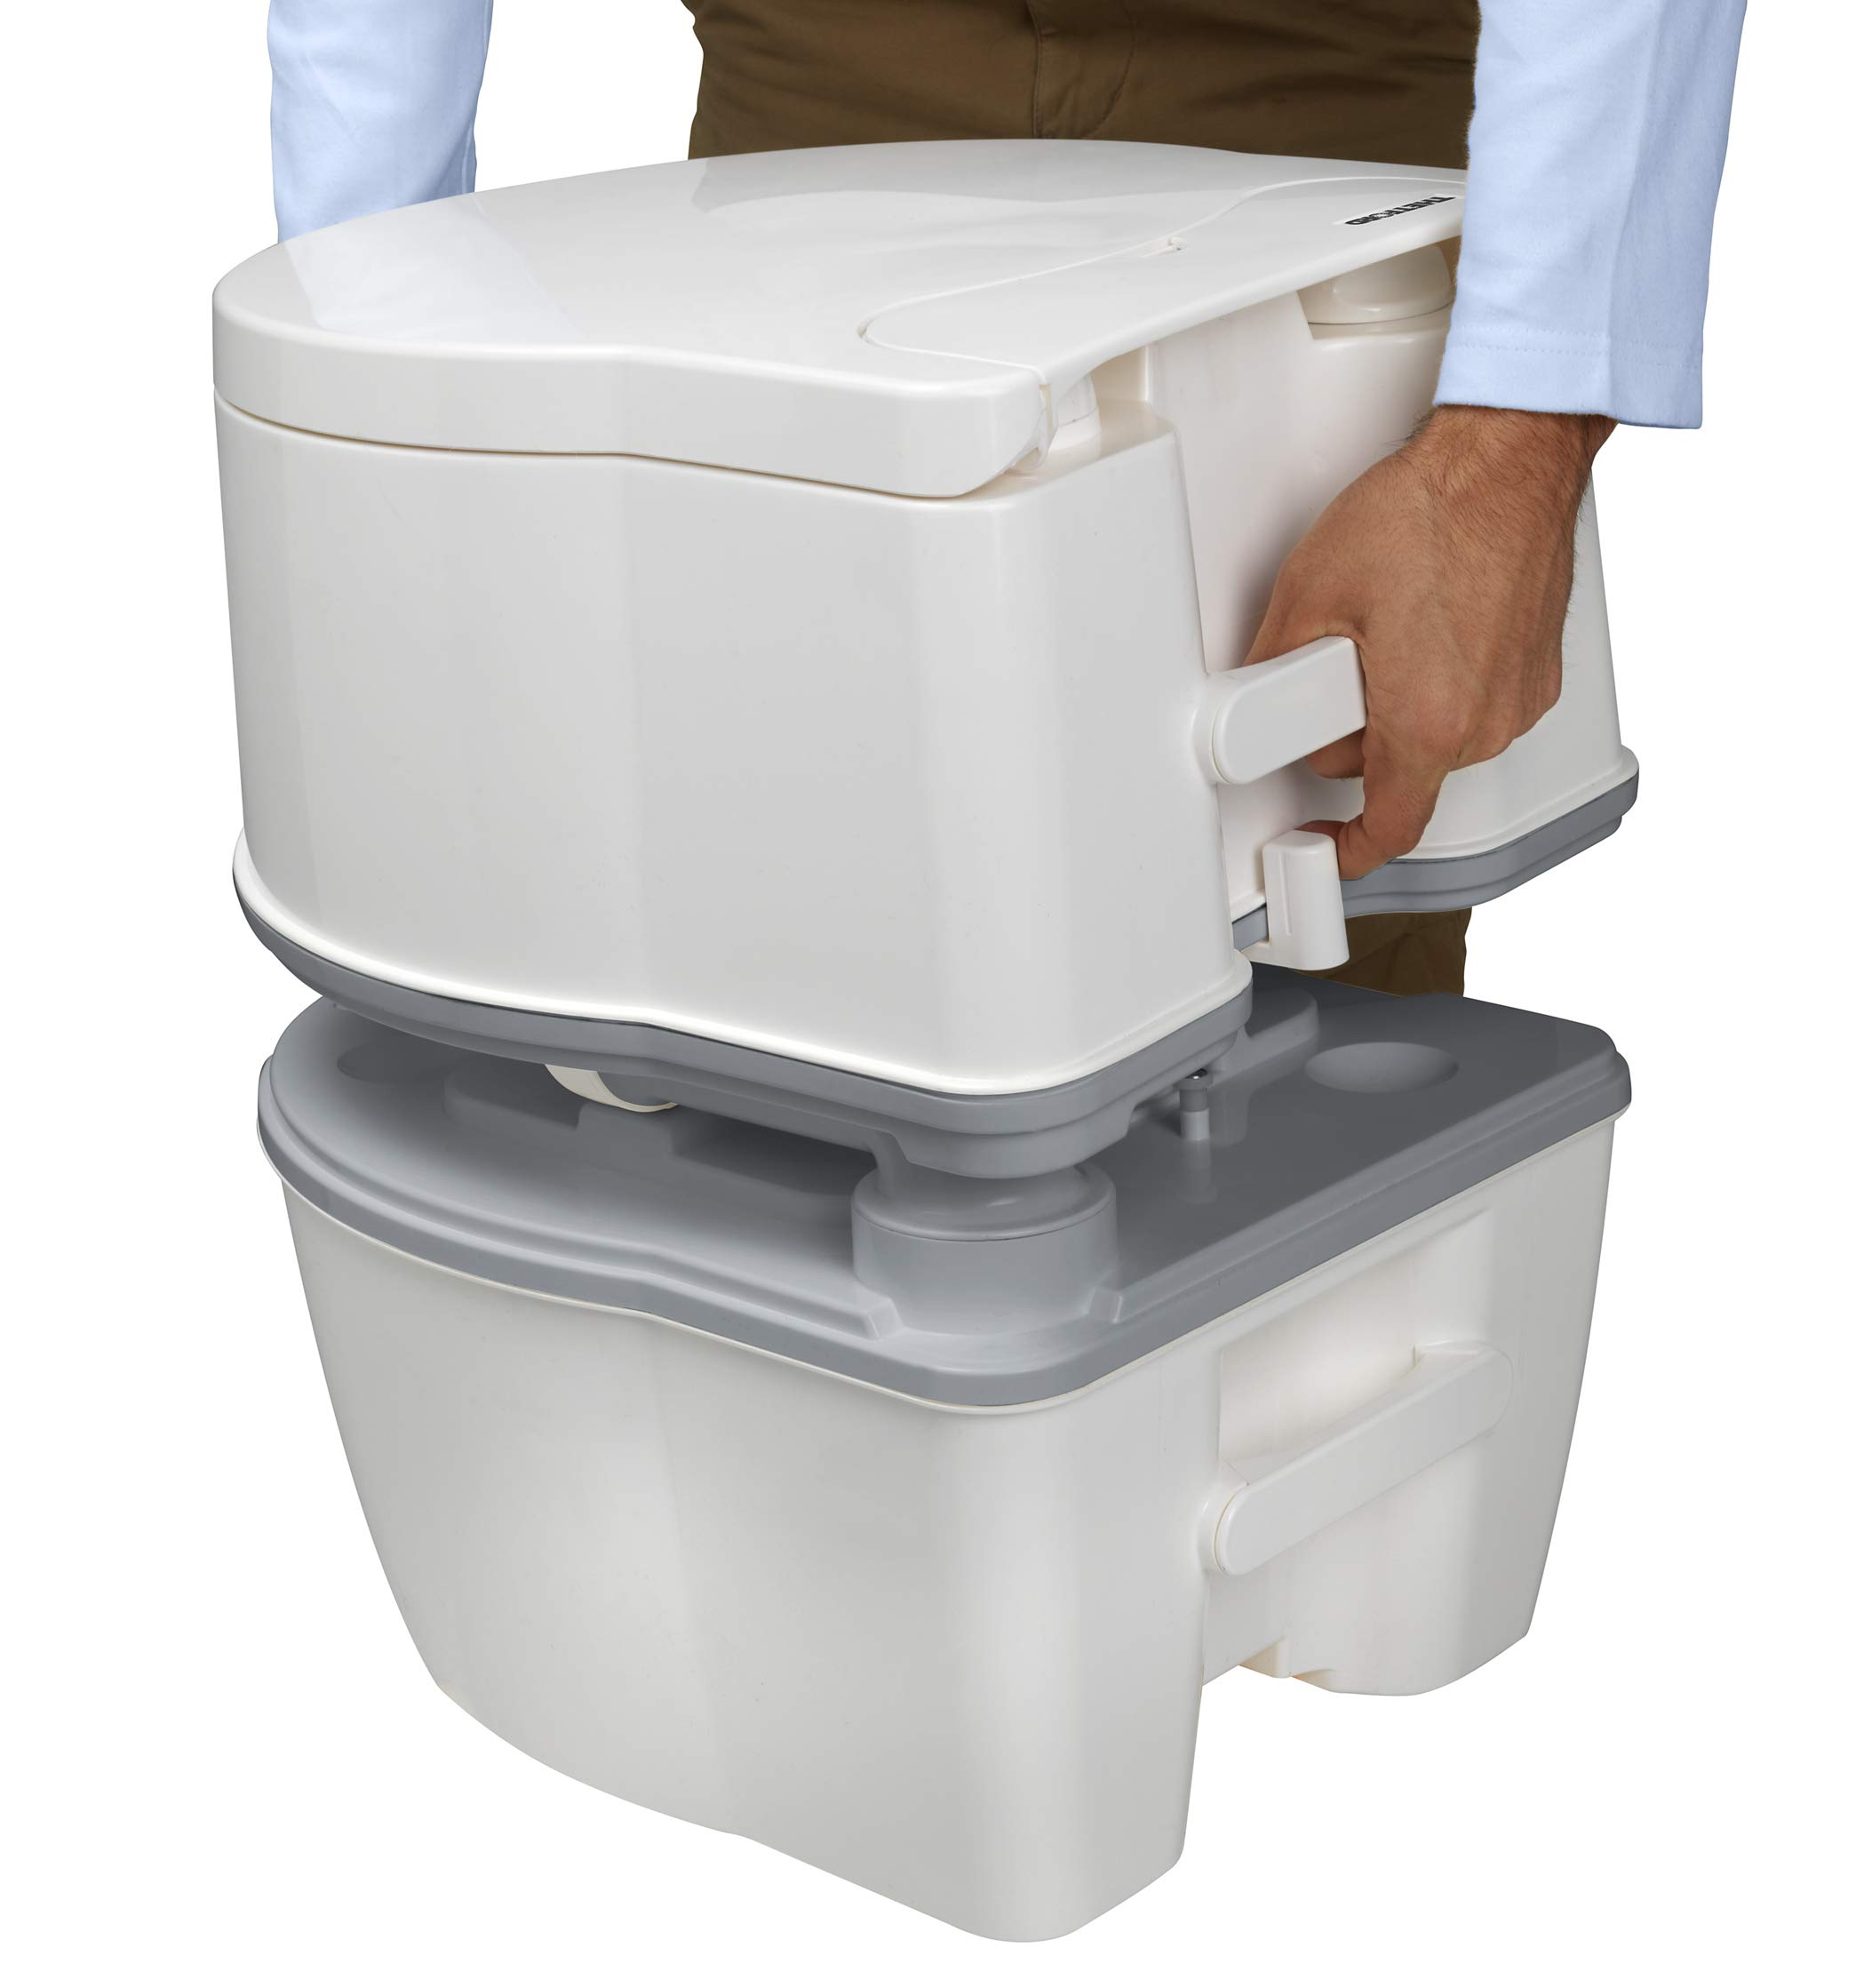 Thetford 92305 Porta Potti 565P Excellence Portable Toilet (Manual), 448 x 388 x 450 mm 15